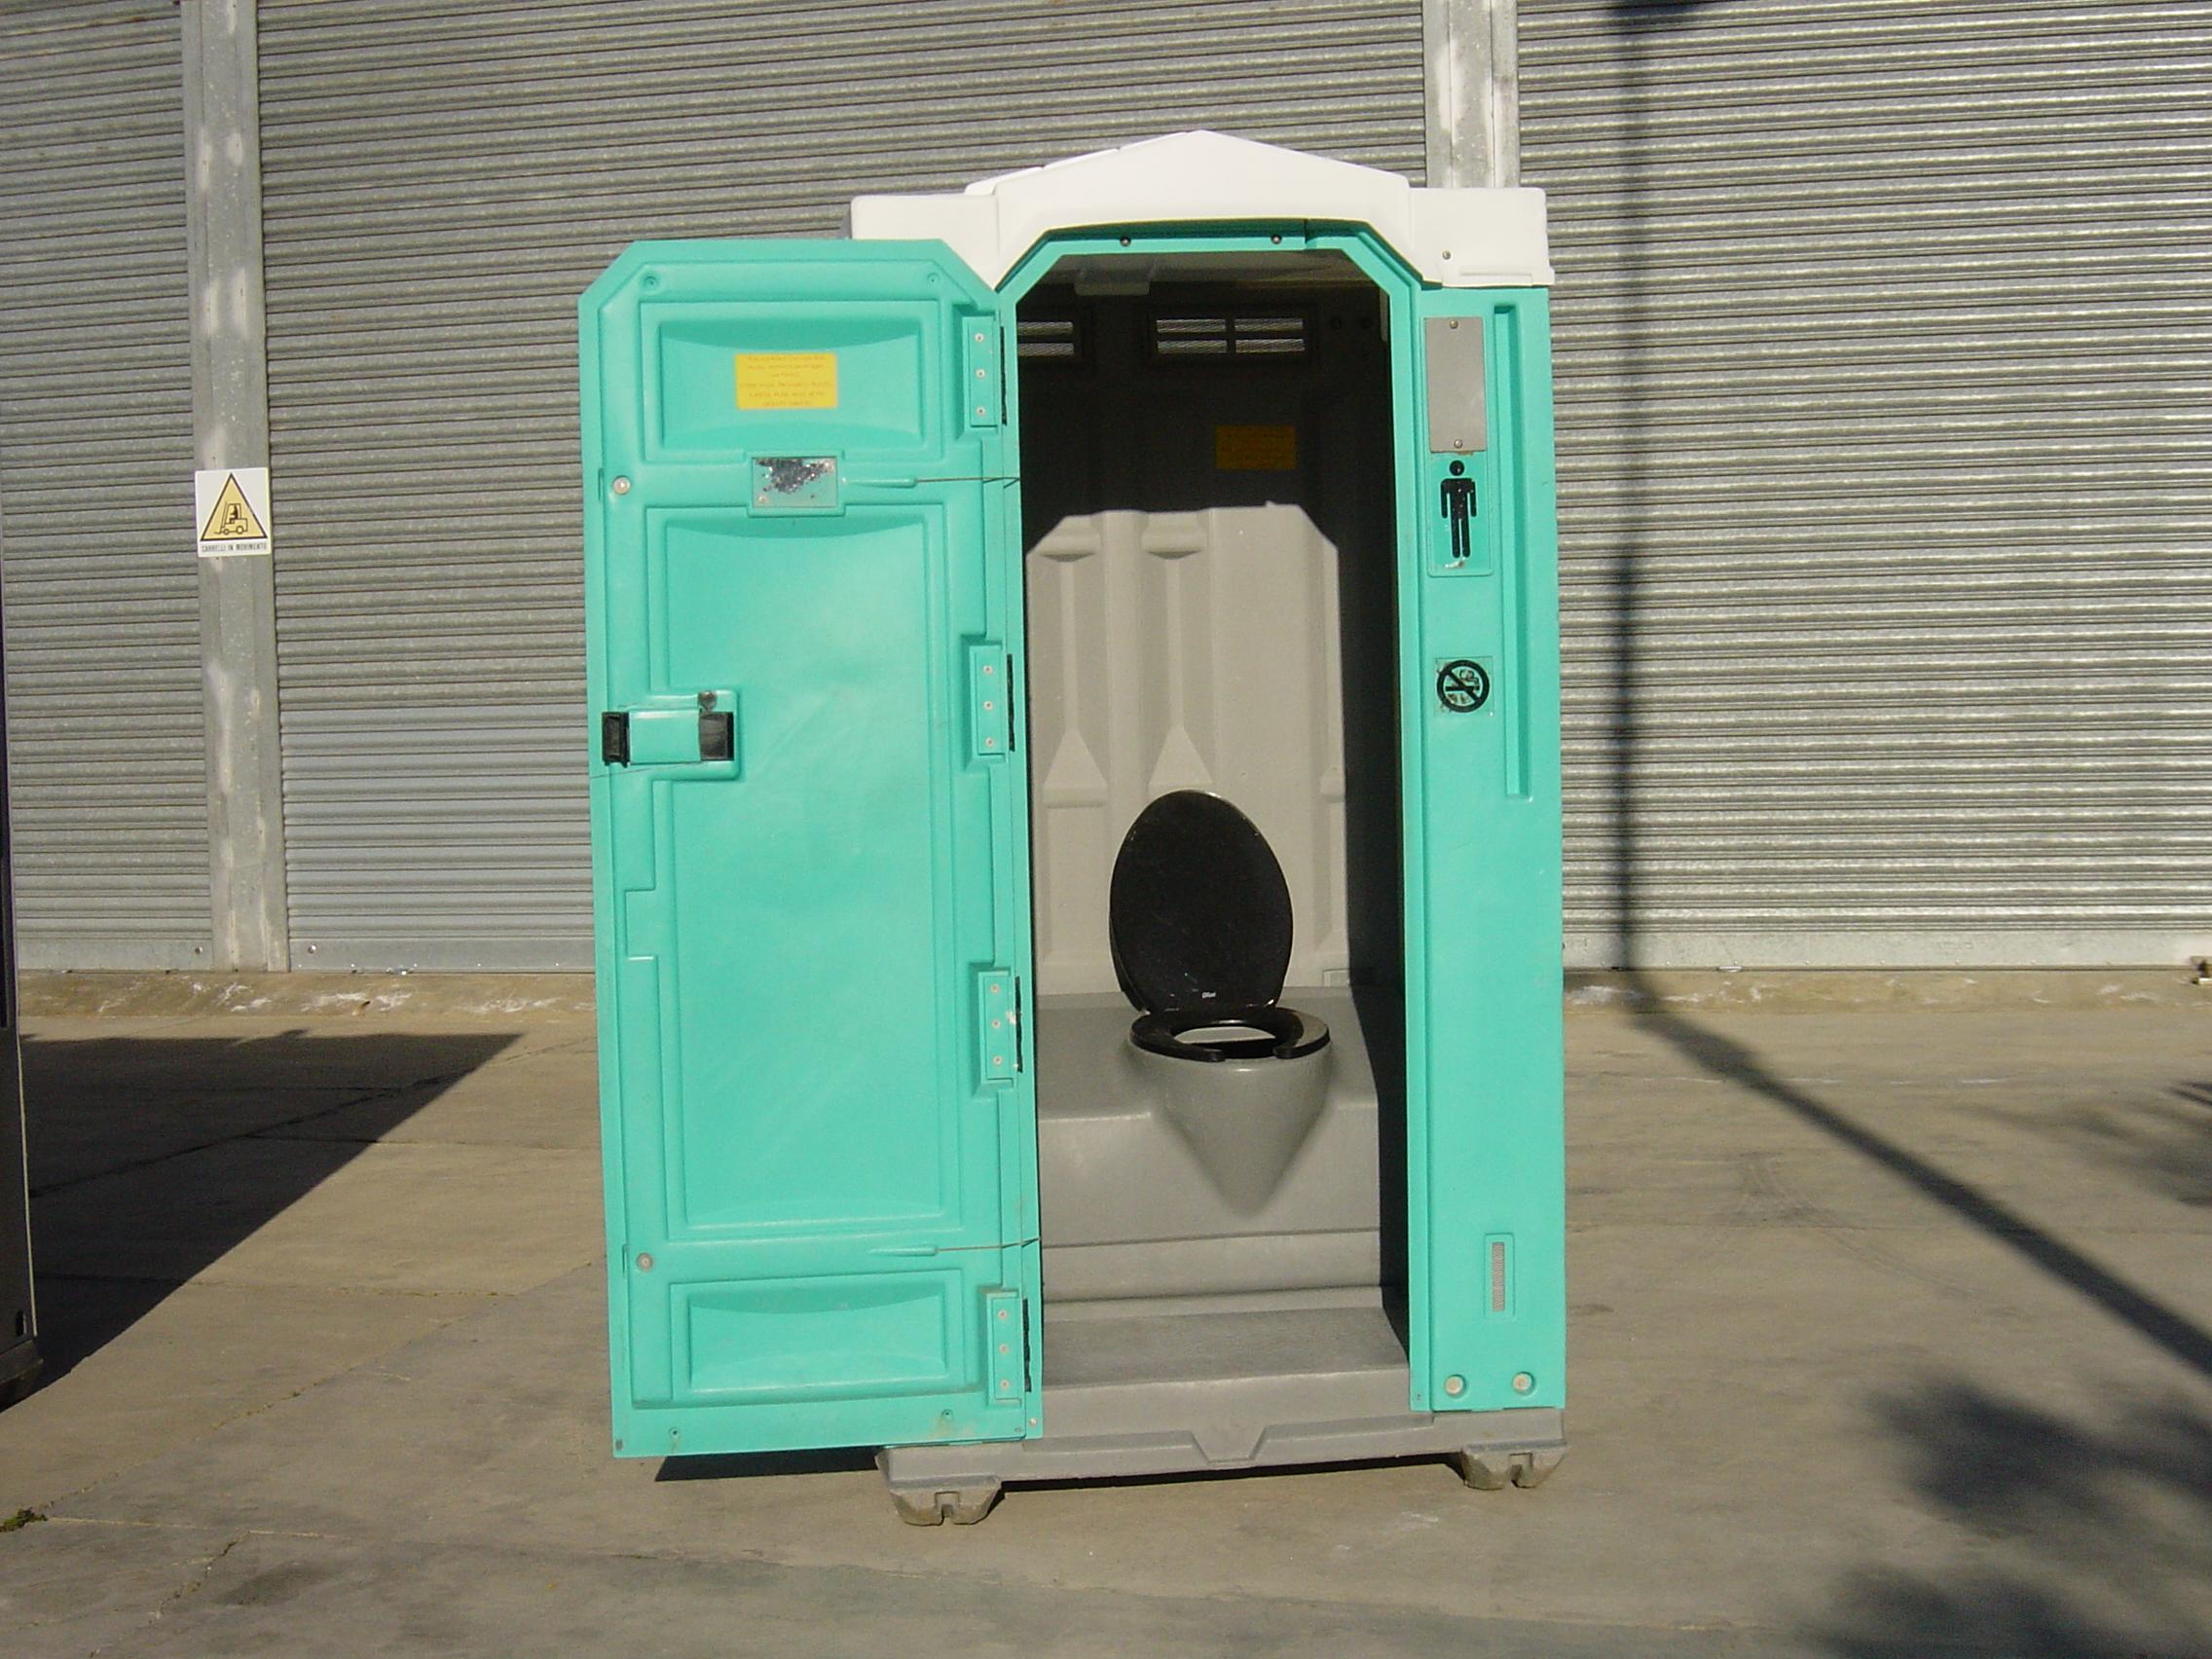 Cabina Bagno Chimico : Commerciale sicula bagni mobili ecologici